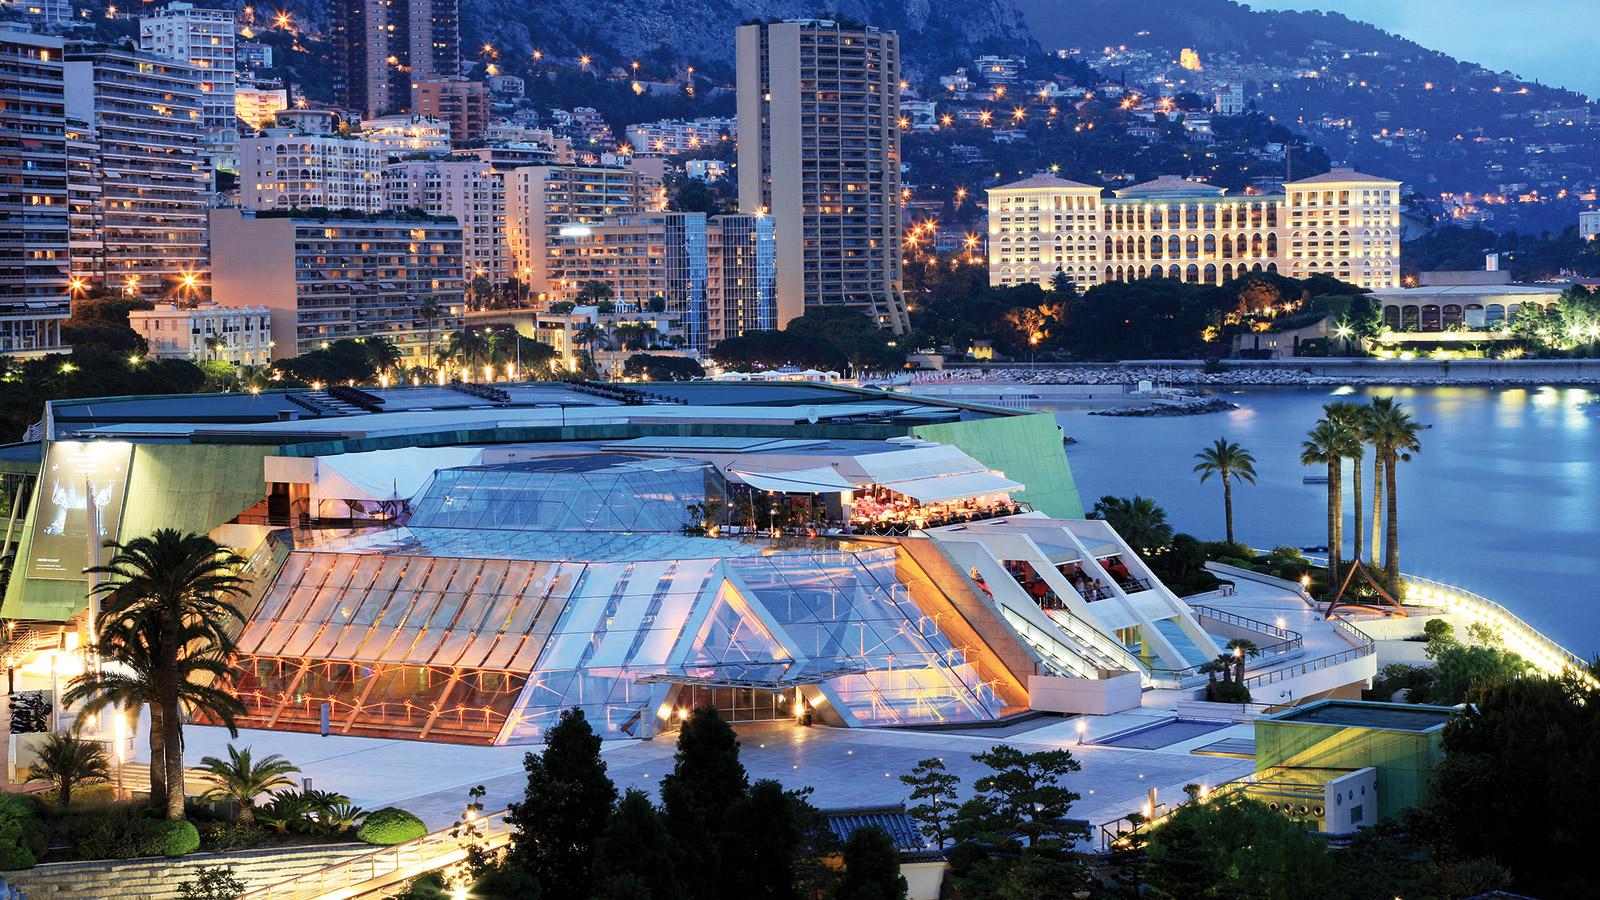 ArtMonteCarlo-Grimaldi-Forum-Monaco_Vue-Generale_credit-JC-Vinaj